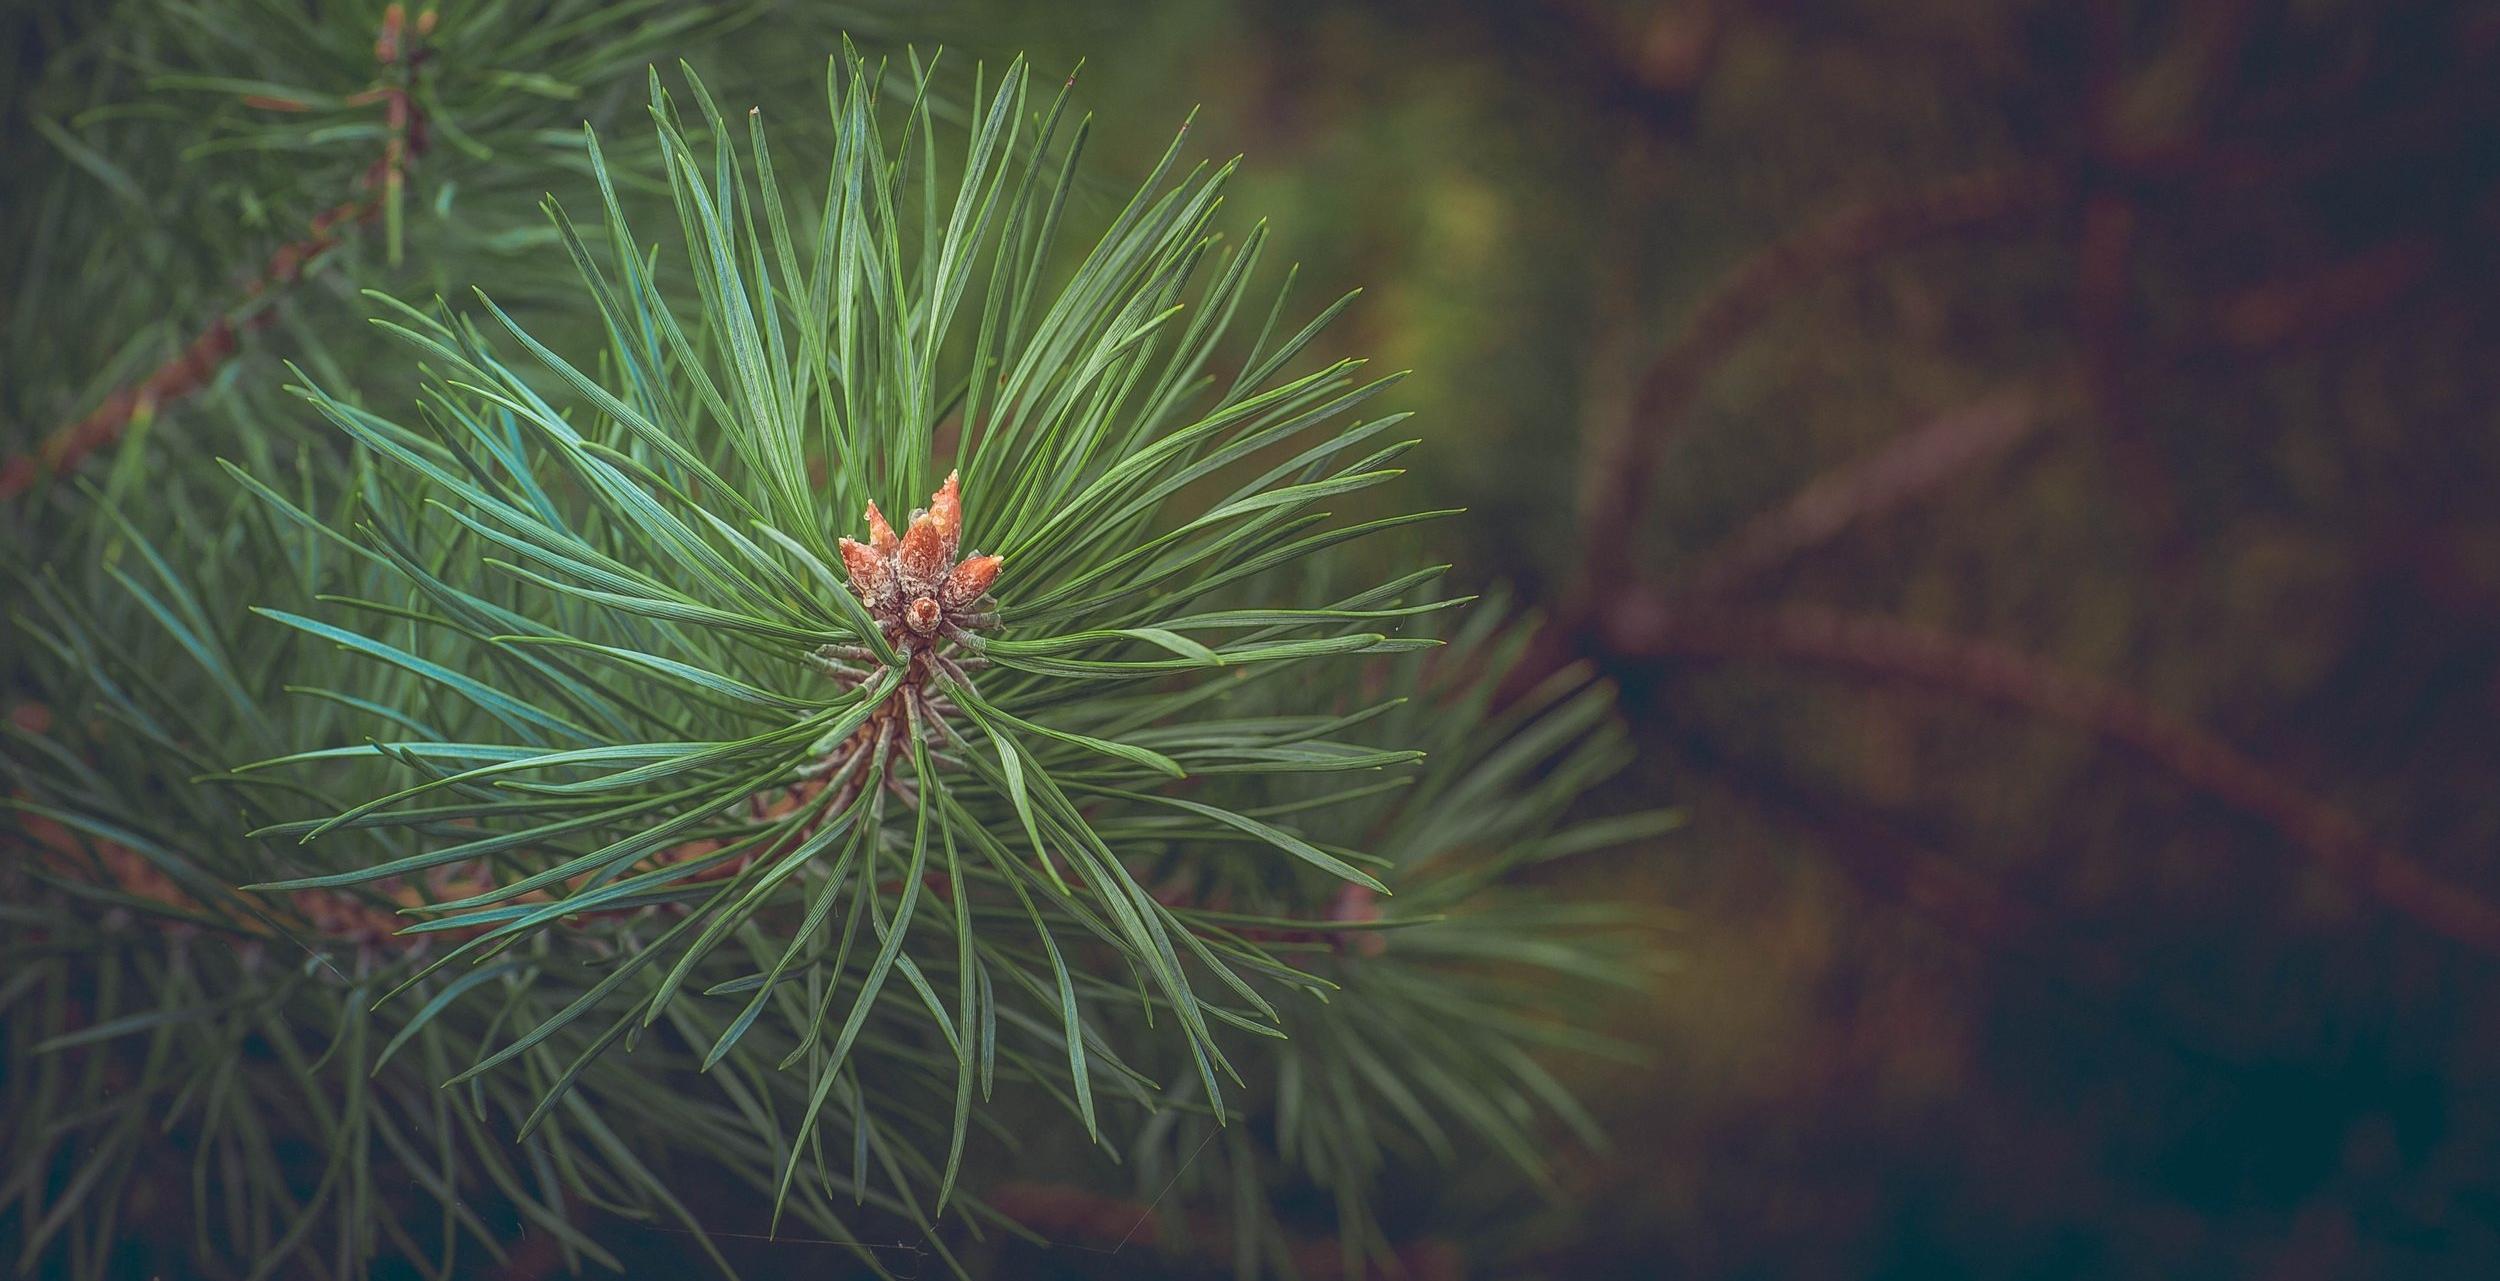 Pine Pixabay.jpg